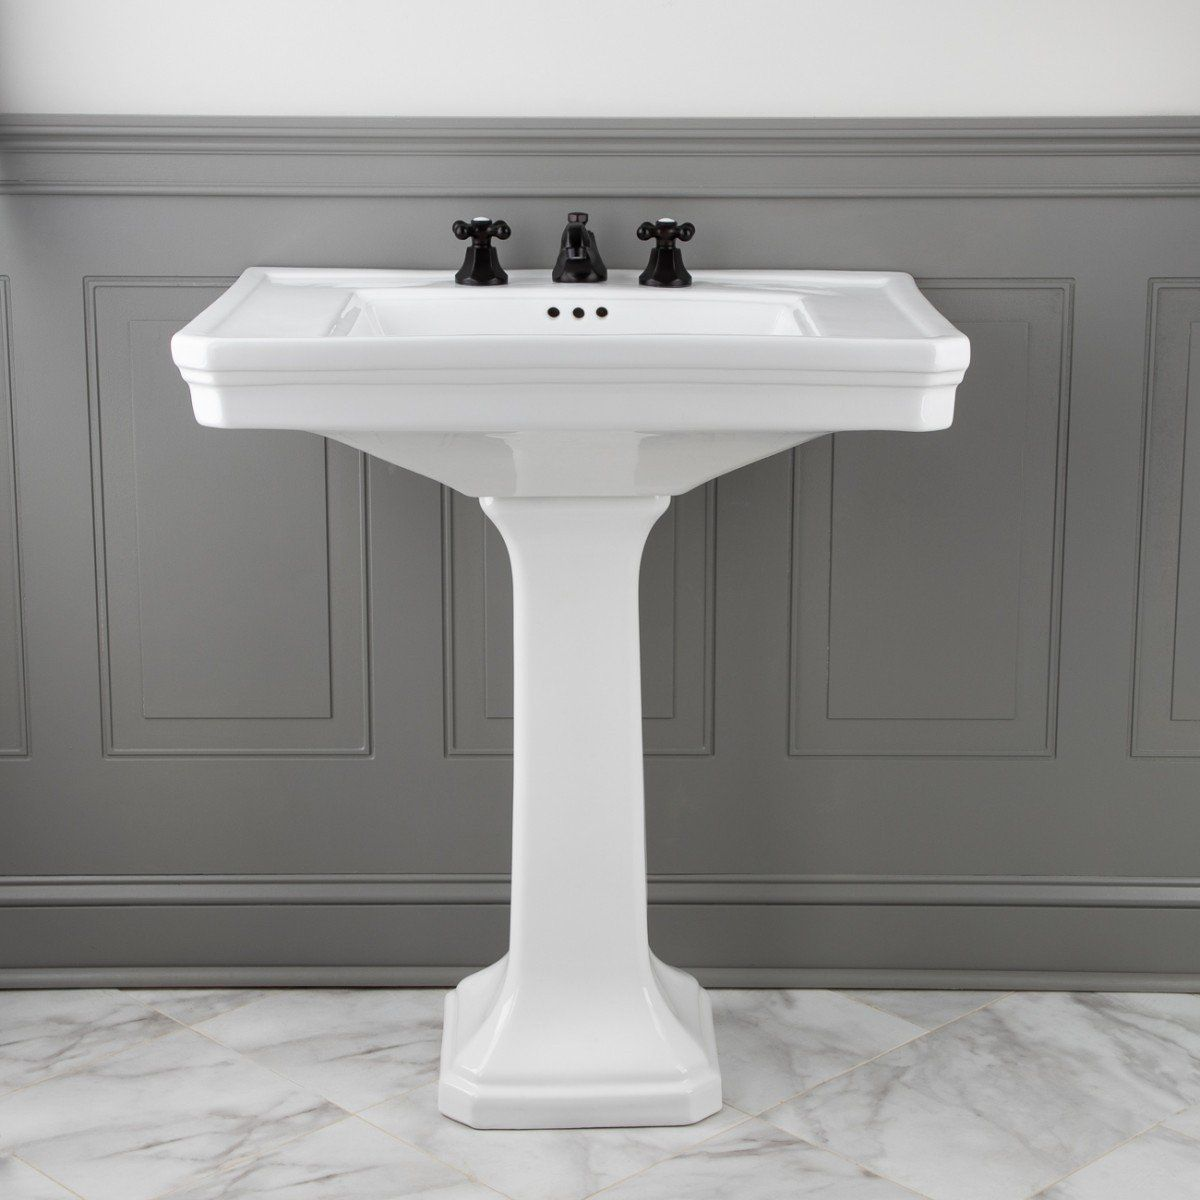 30 Inch Pedestal Sink Pedestal Sink Pedestal Sink Bathroom Pedestal Sinks 30 inch pedestal sink